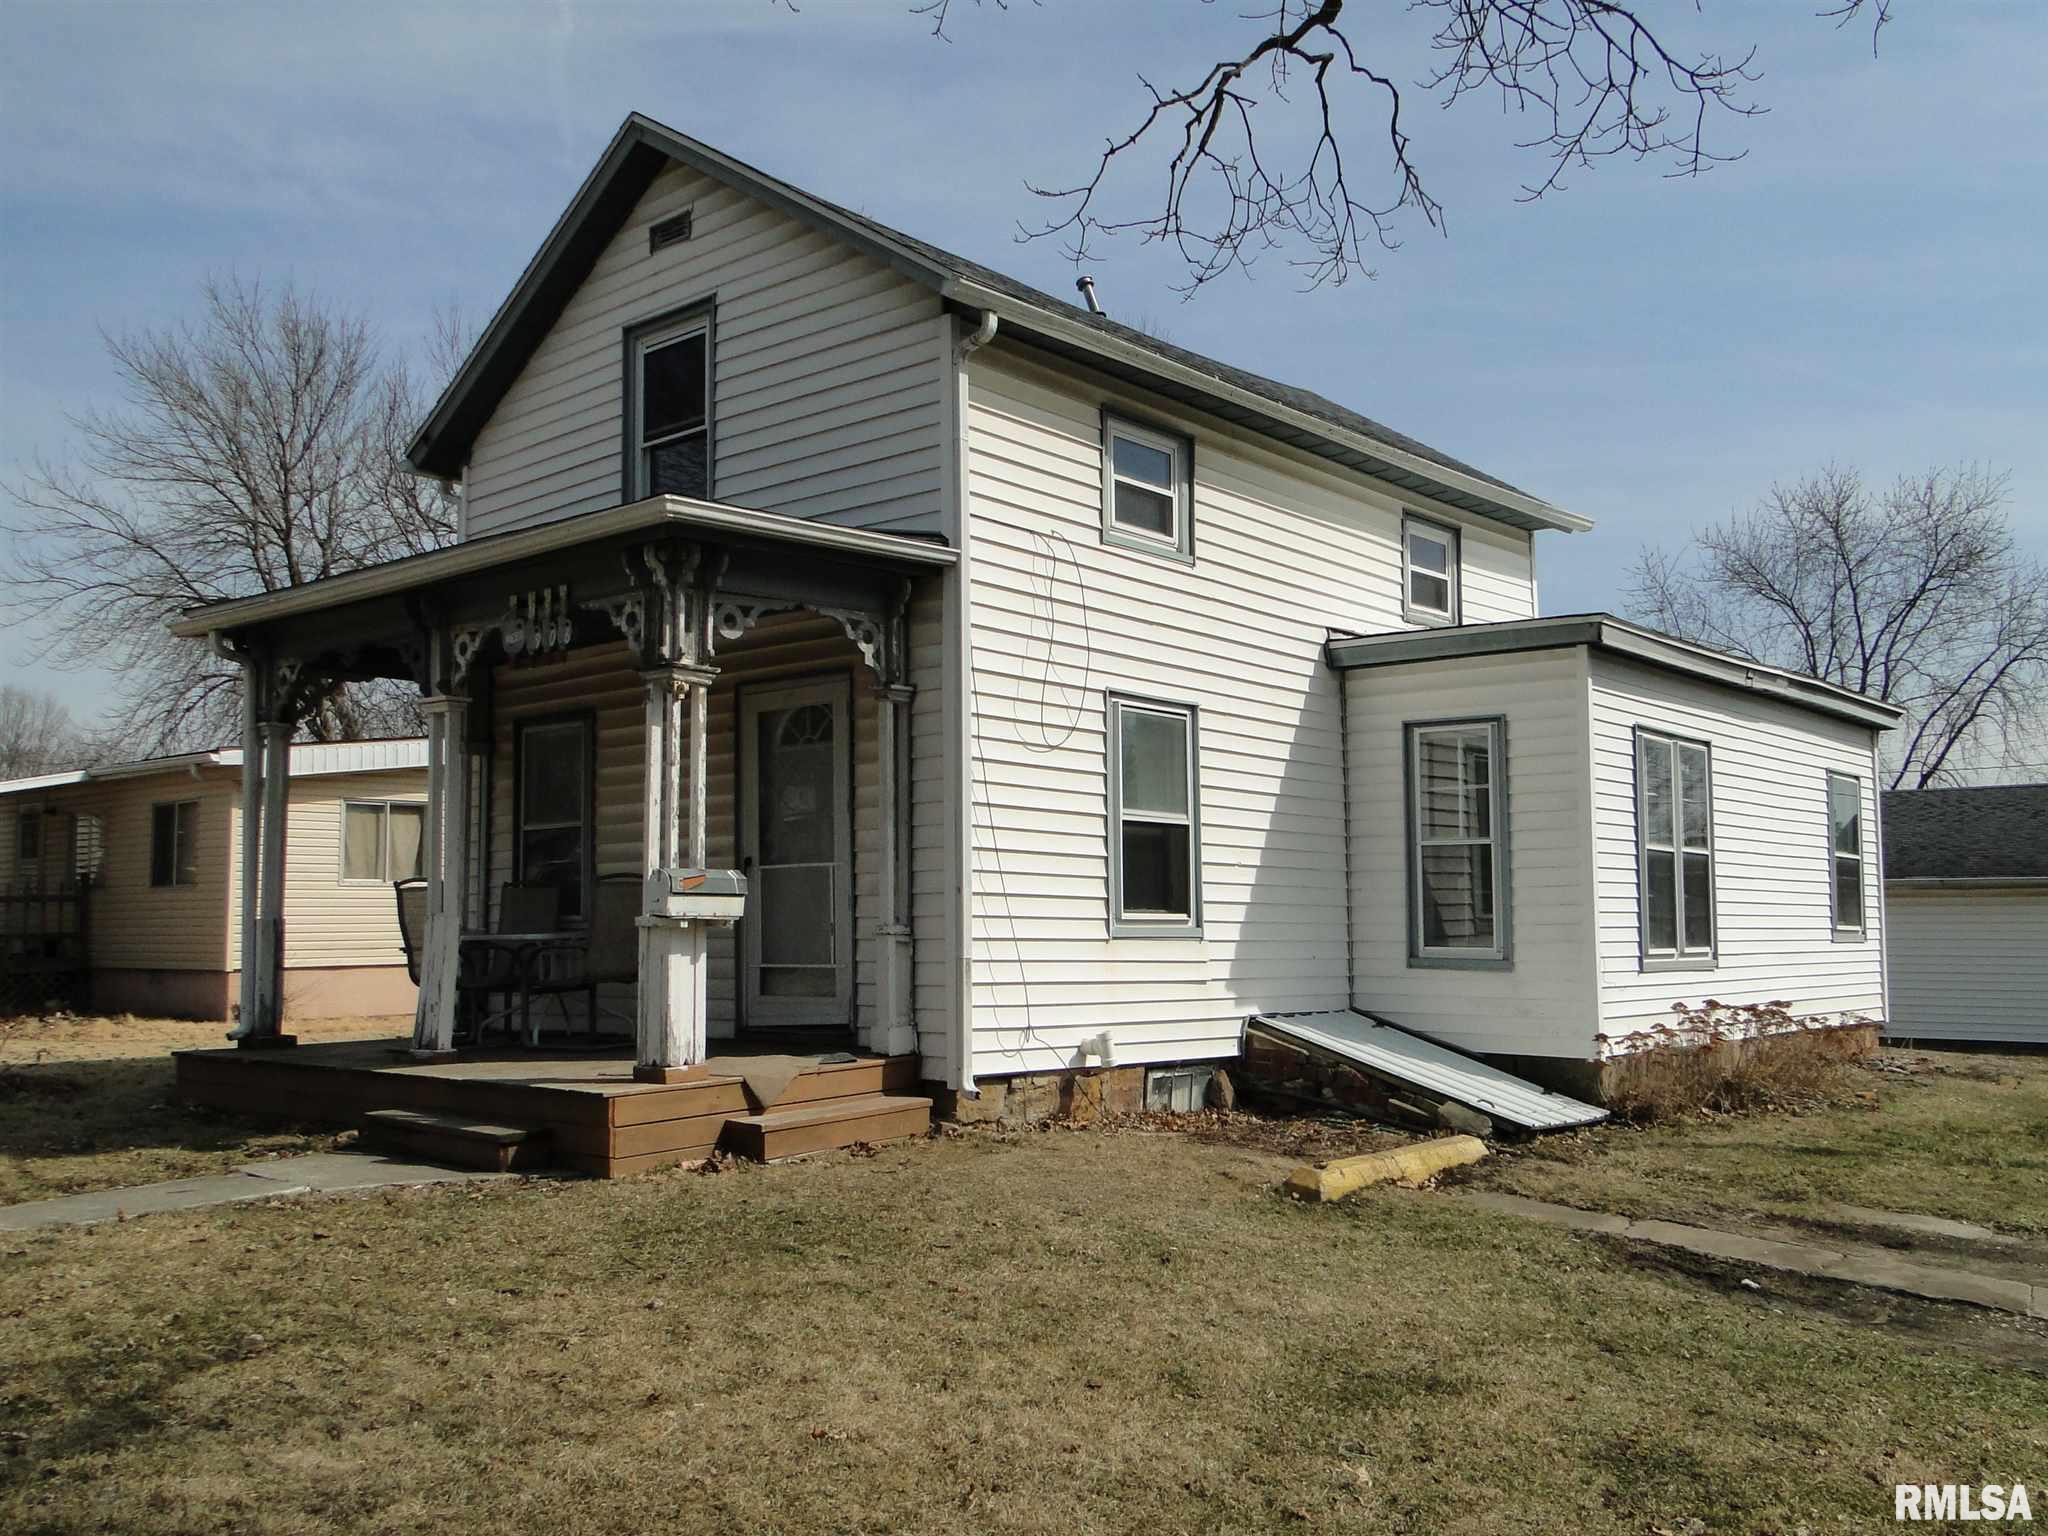 906 N Rile Property Photo - Bushnell, IL real estate listing